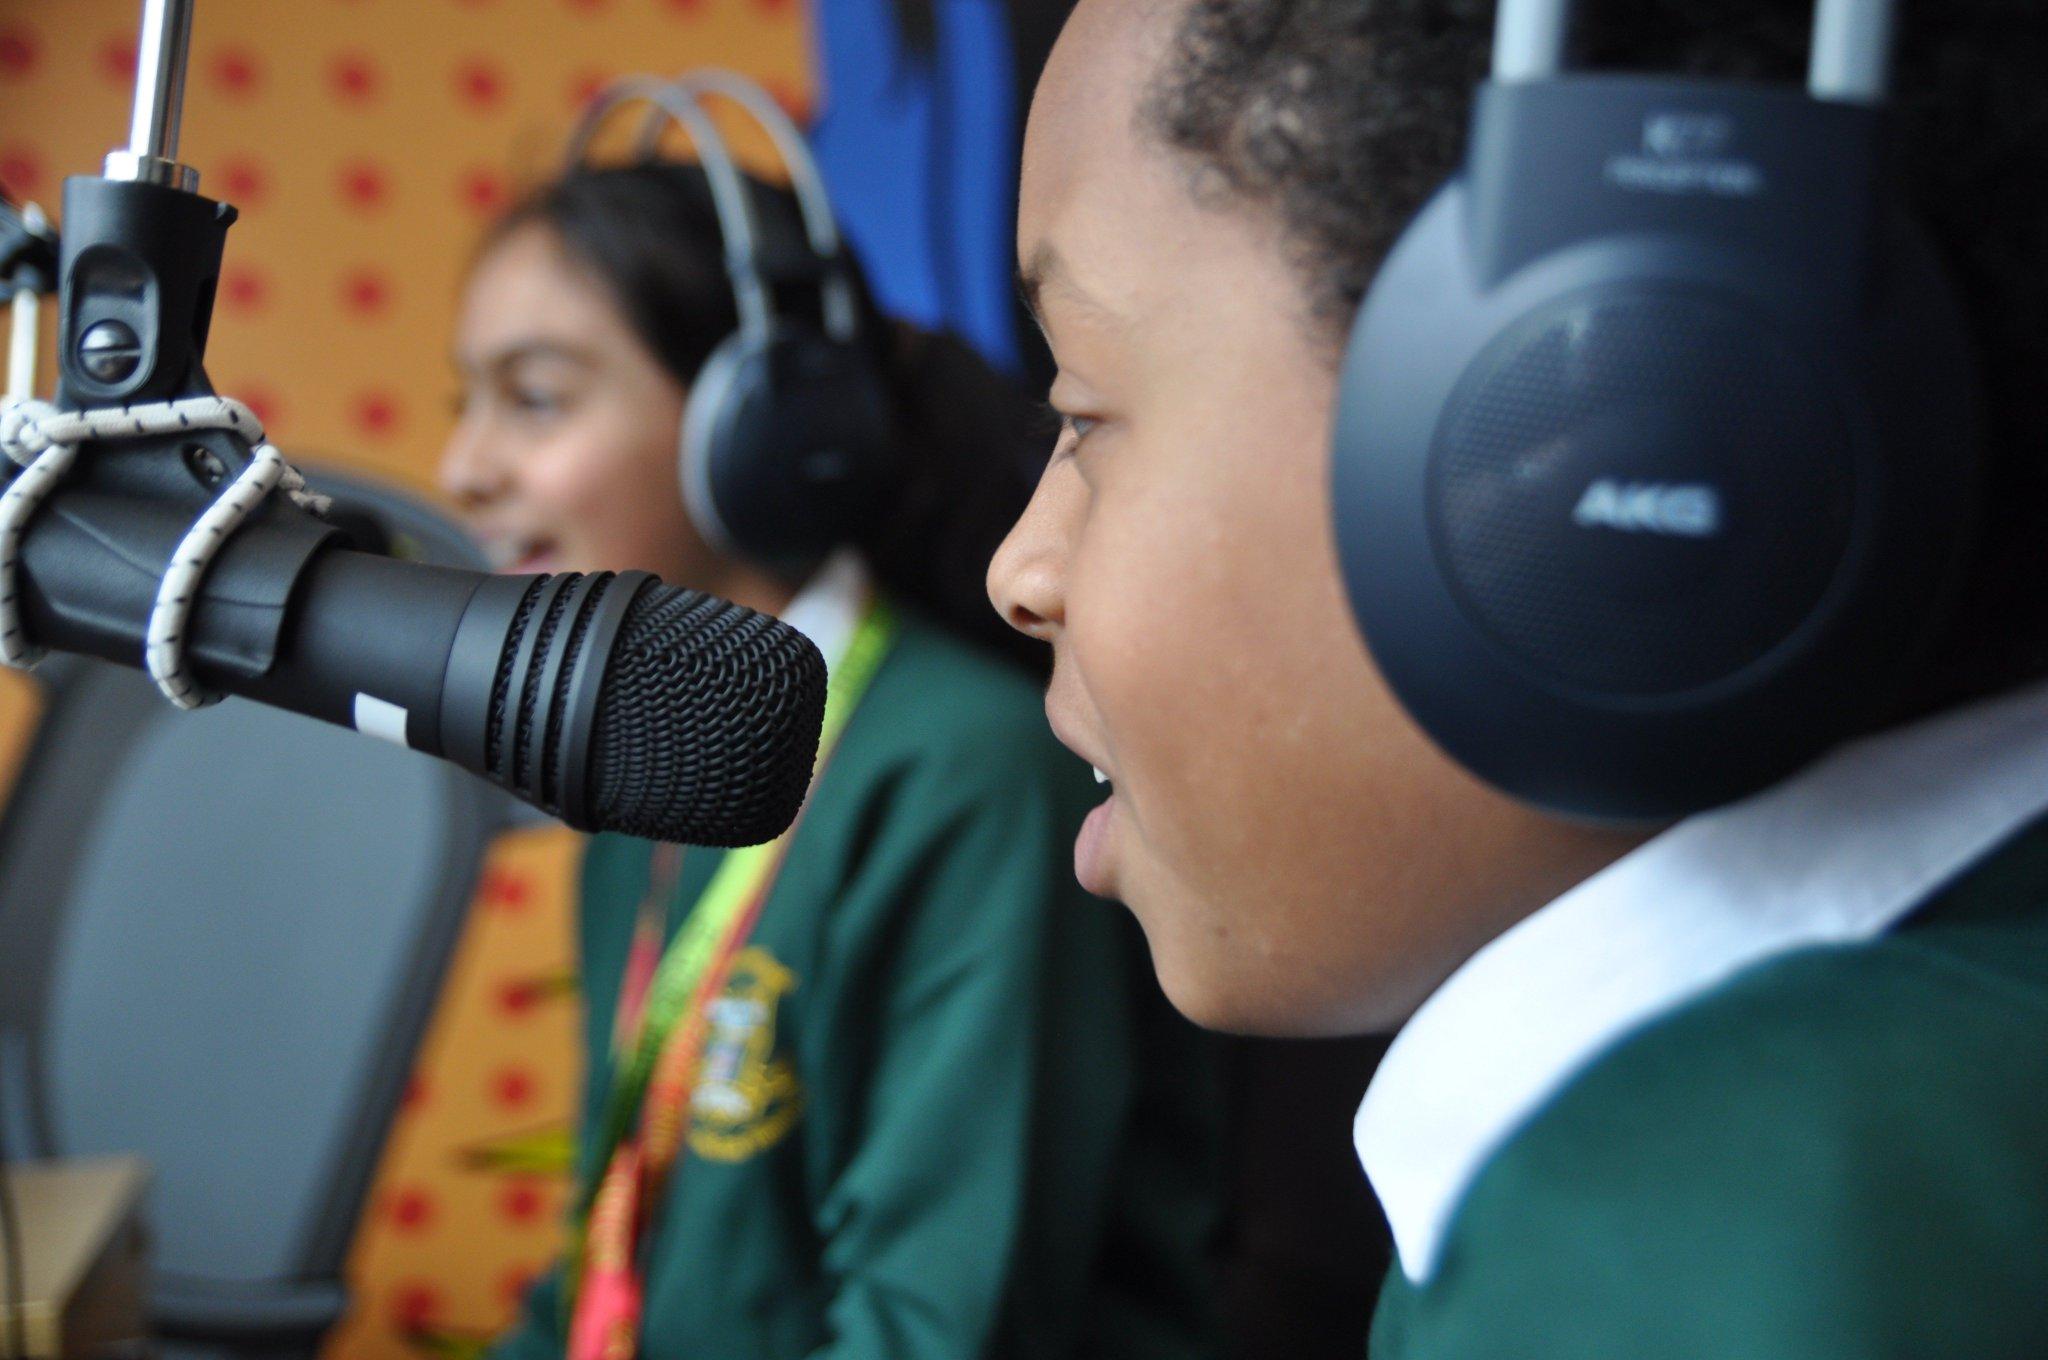 Children will be discussing the #RefugeeCrisis on Radio Adderley this week #InSearchofSafety #RefugeeWeek @UNICEF_uk https://t.co/4rhDkZcfMq